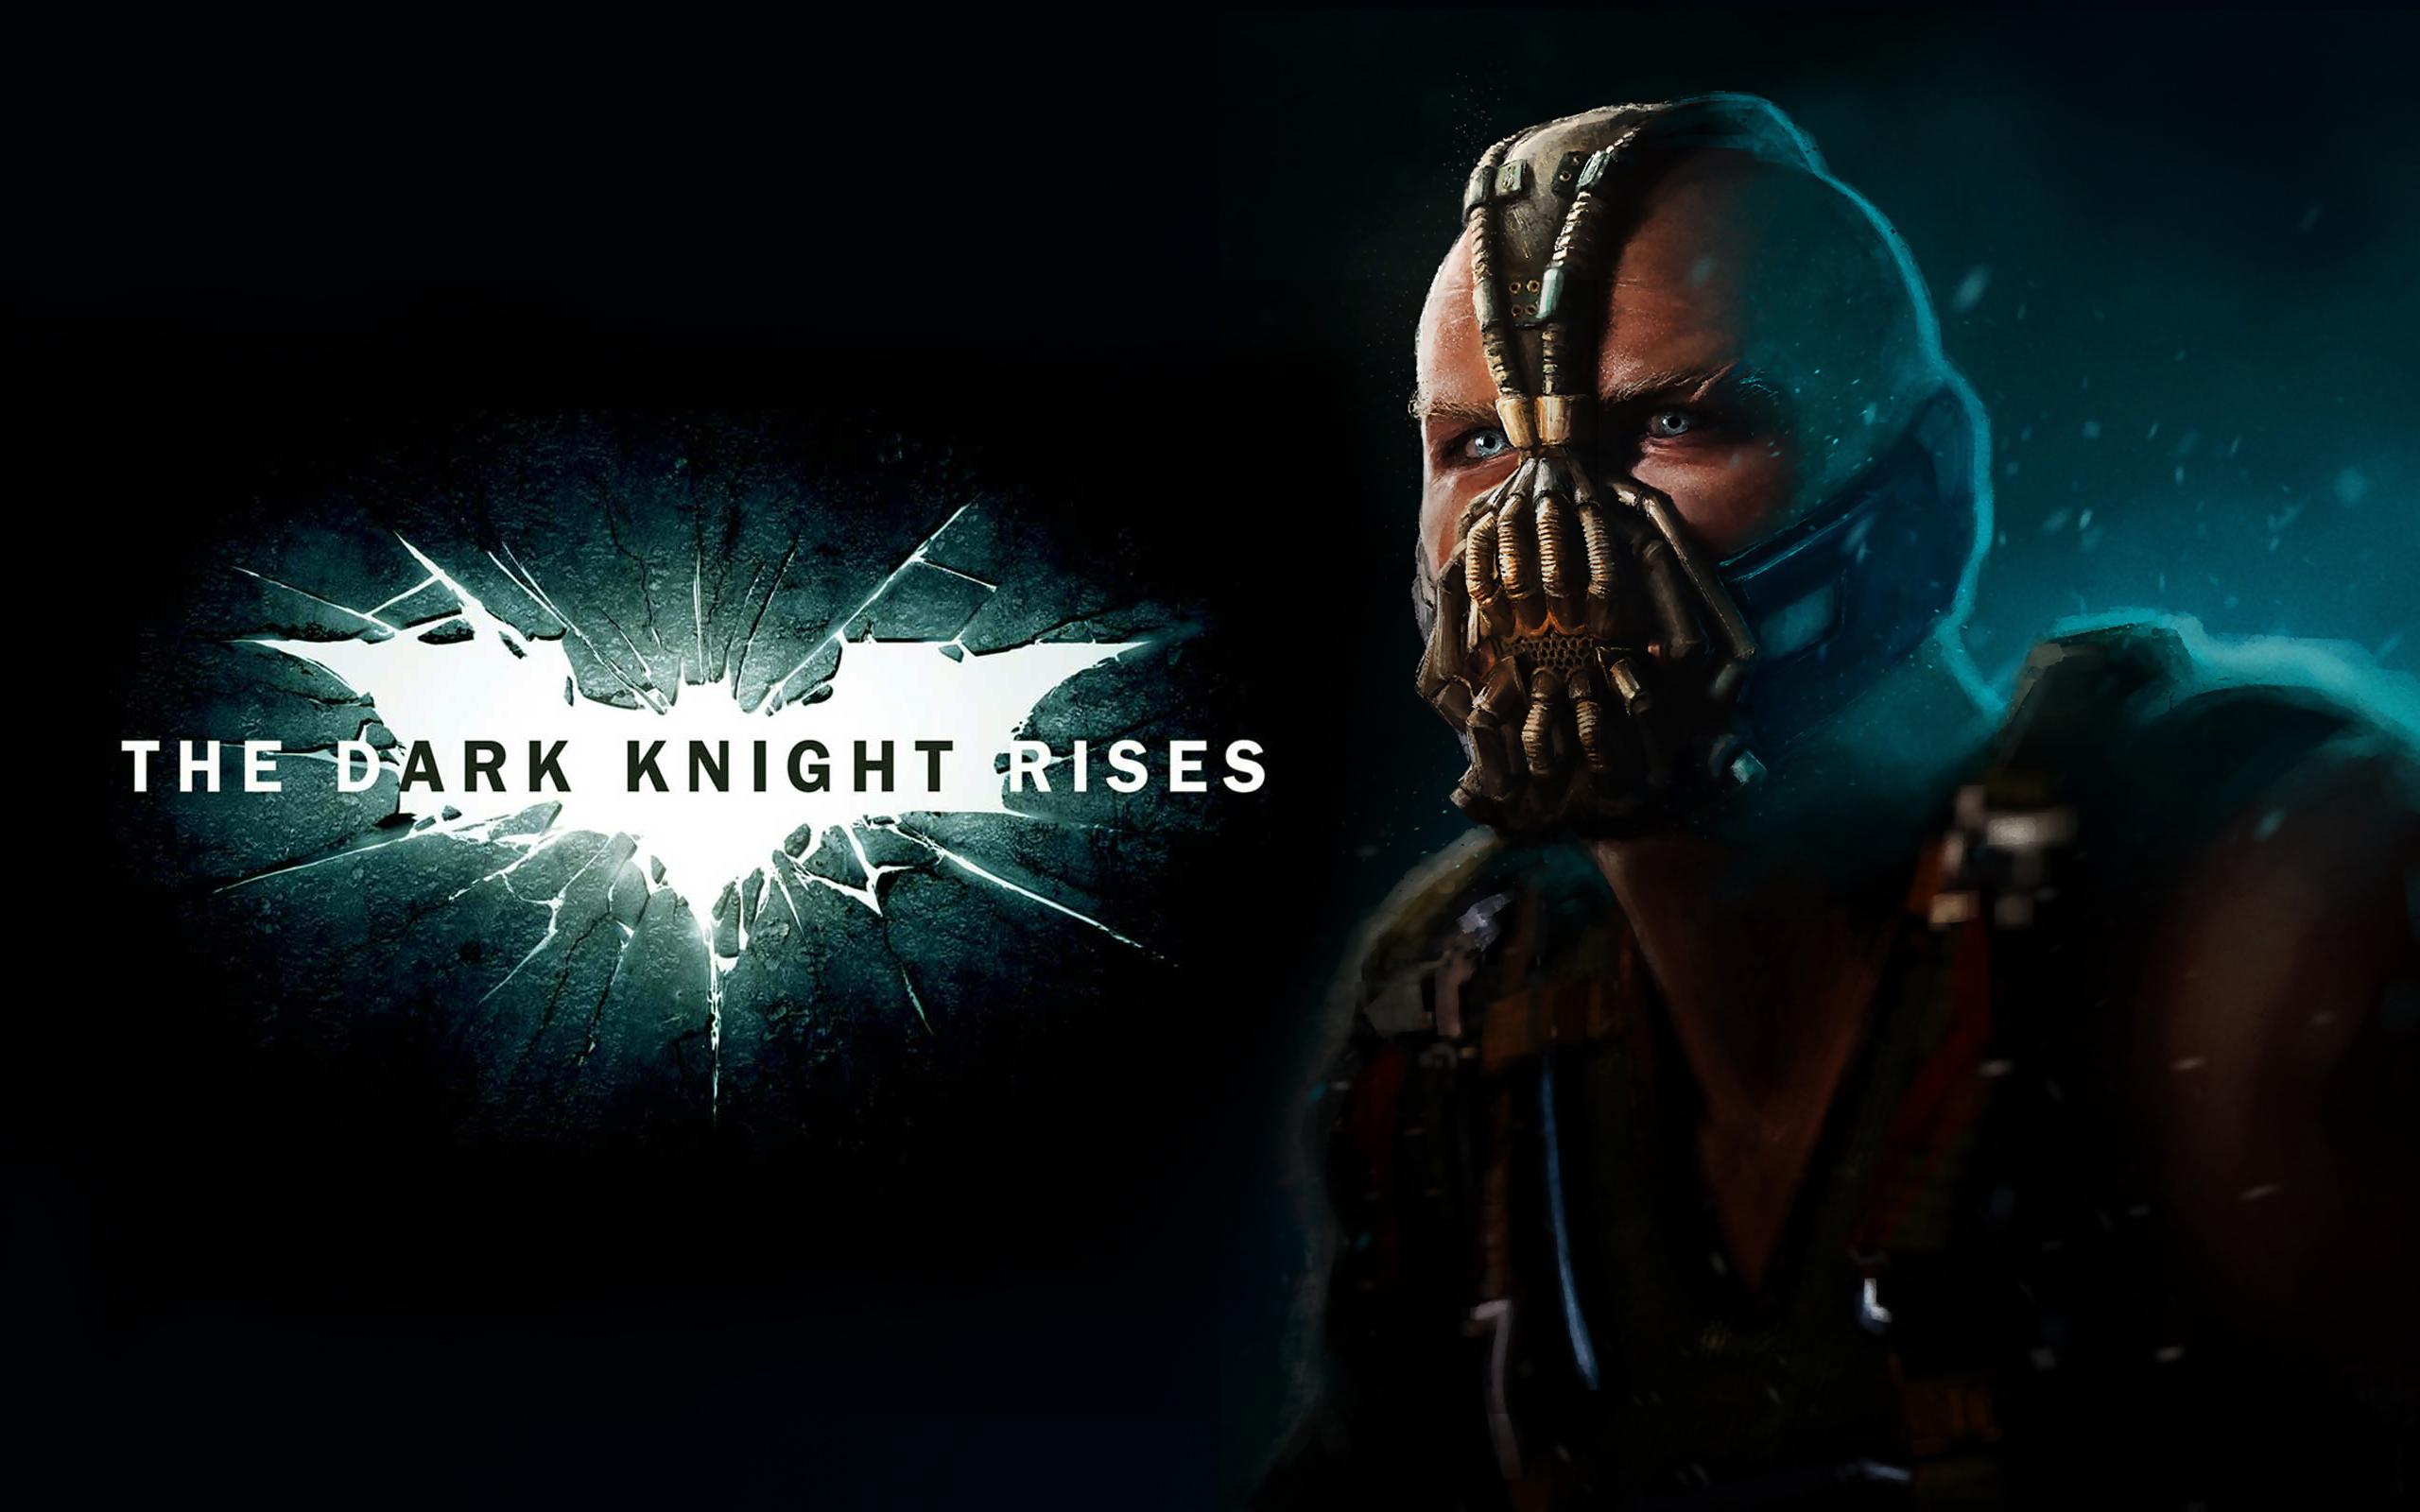 Dark Knight Rises Bane Batman Wallpaper 2560x1600